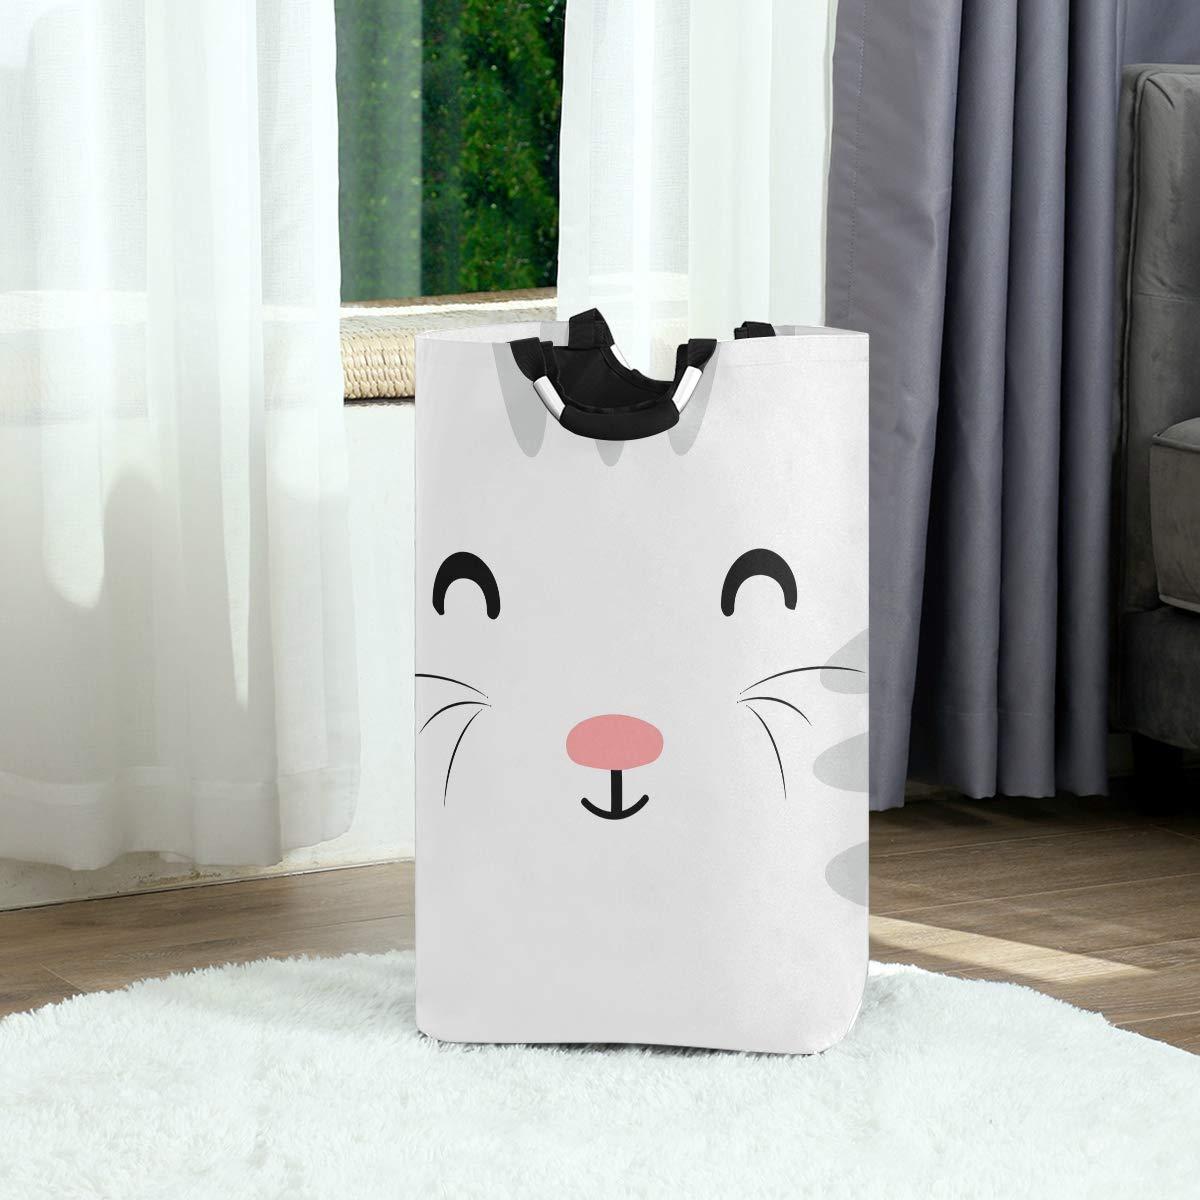 Unimagic Collapsible Laundry Basket Lovely Cat Face Laundry Hamper Large Cloth Hamper Laundry Organizer Holder with Handle